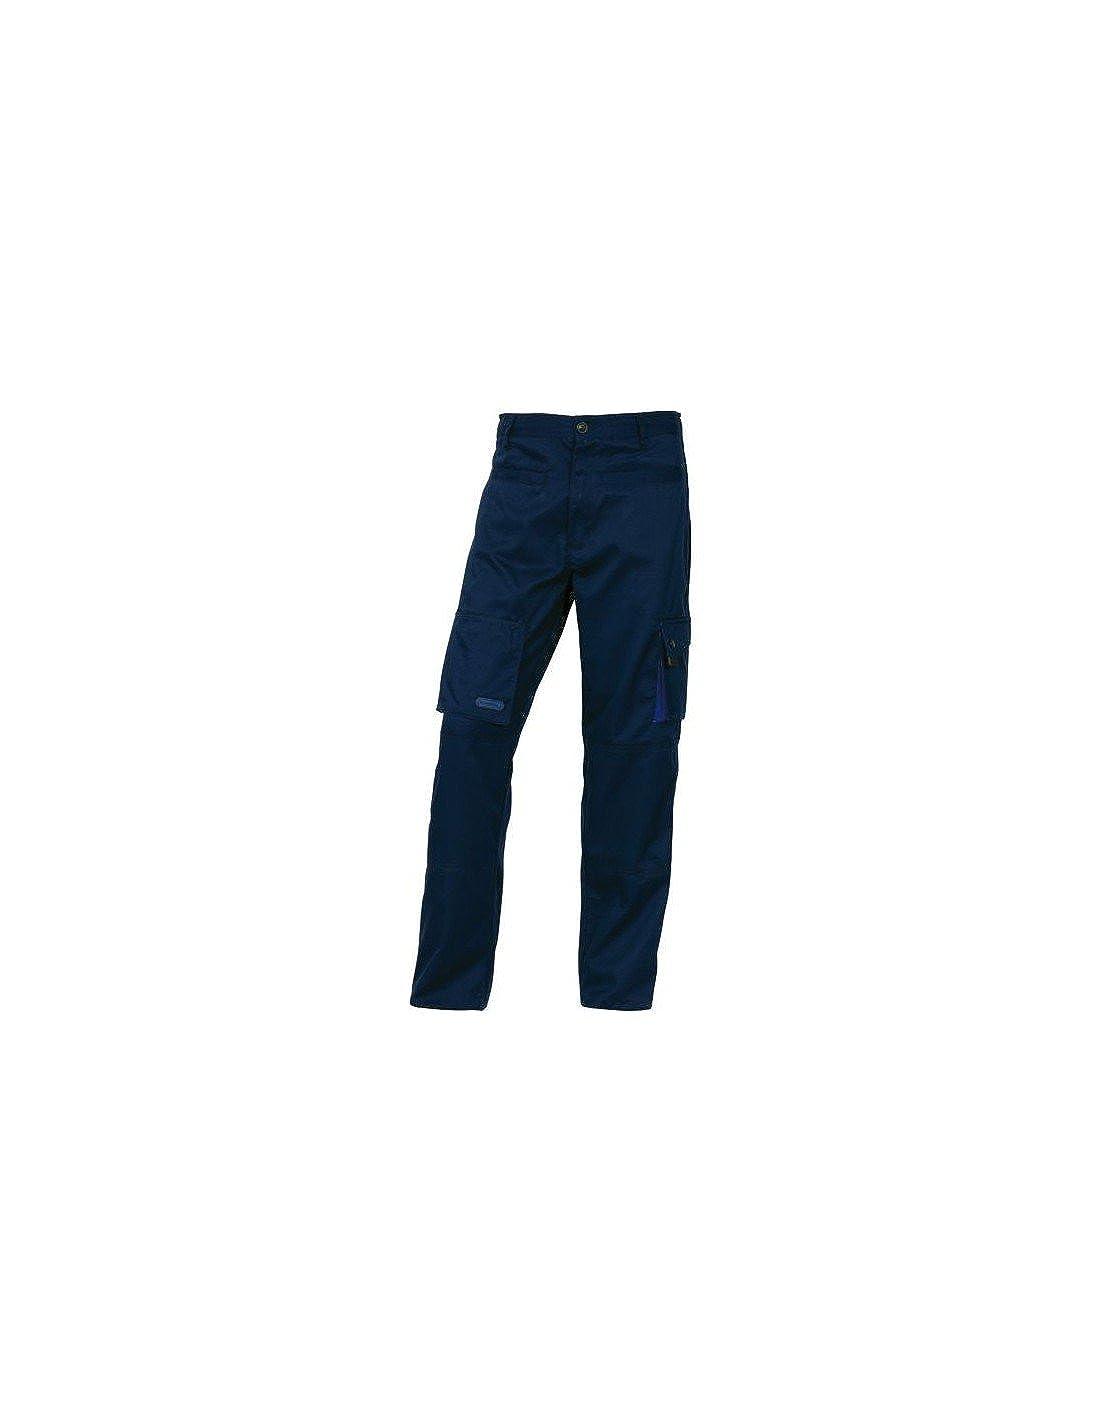 TALLA xx-large. Delta plus–m2pan Mens Pantalones de Trabajo